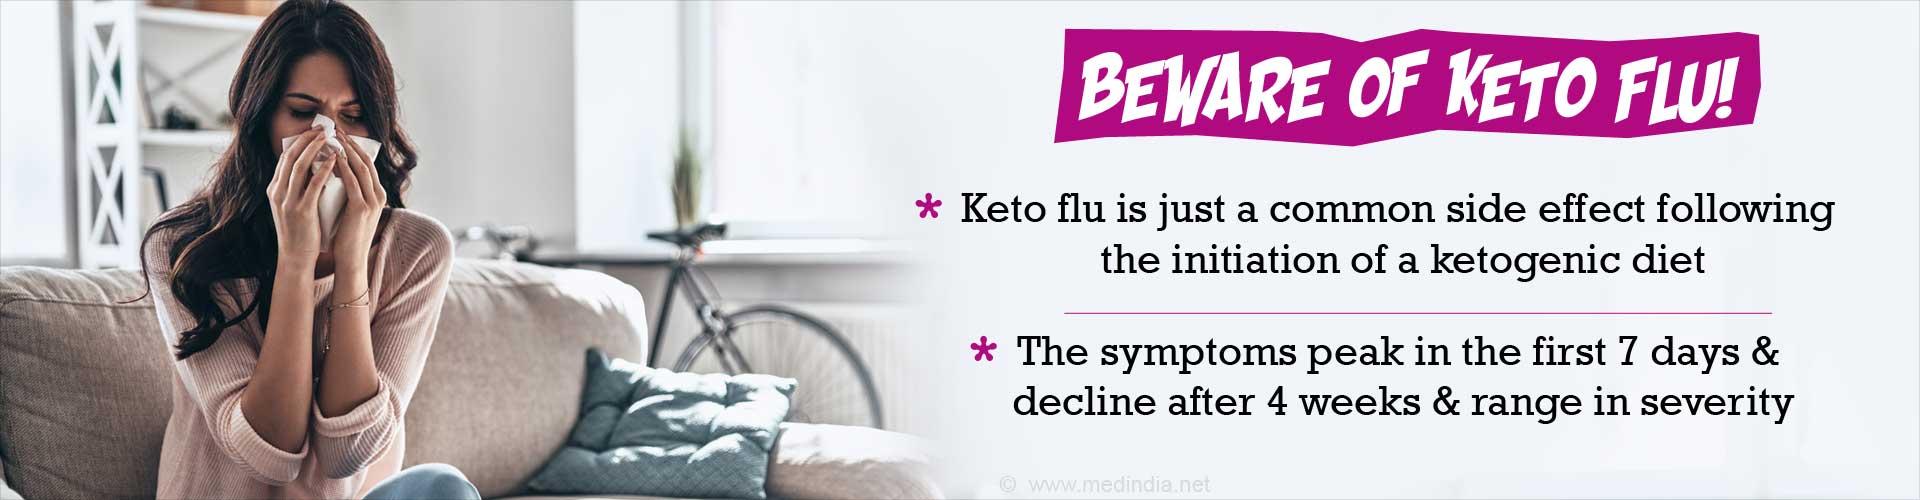 Keto Flu: Ketogenic Diet may Trigger Flu-like Symptoms during Initial Weeks